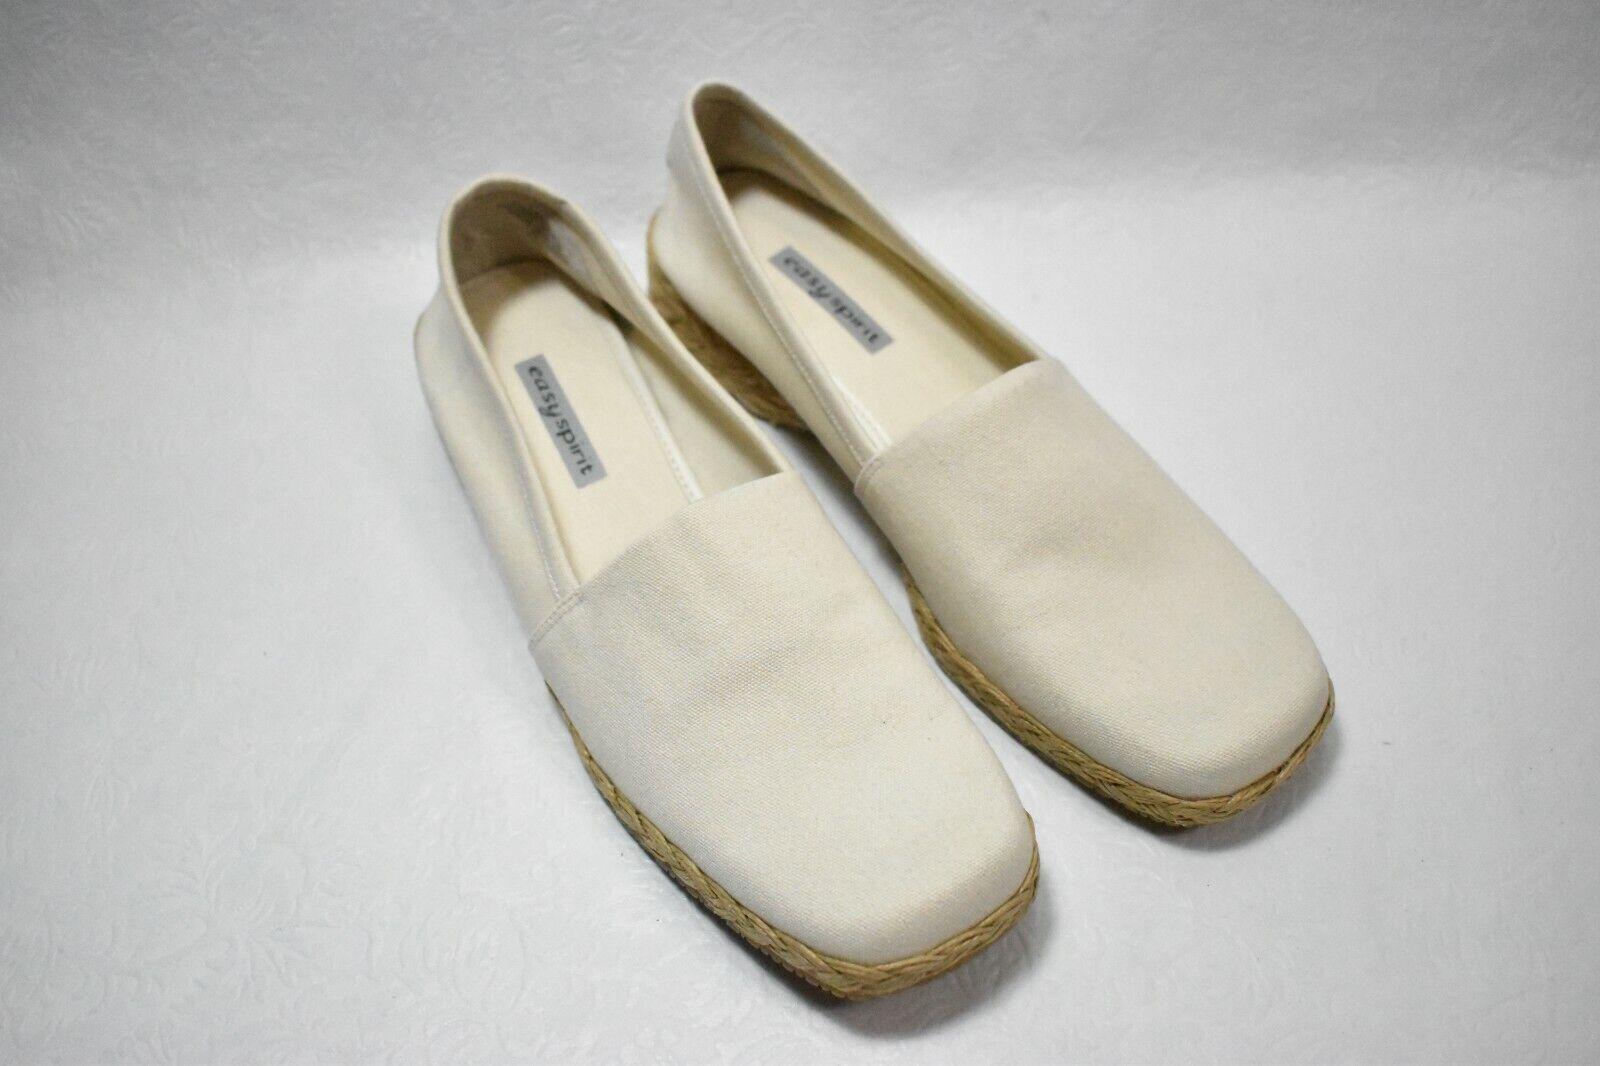 Easy Spirit Shoes Anti-Gravity Natural